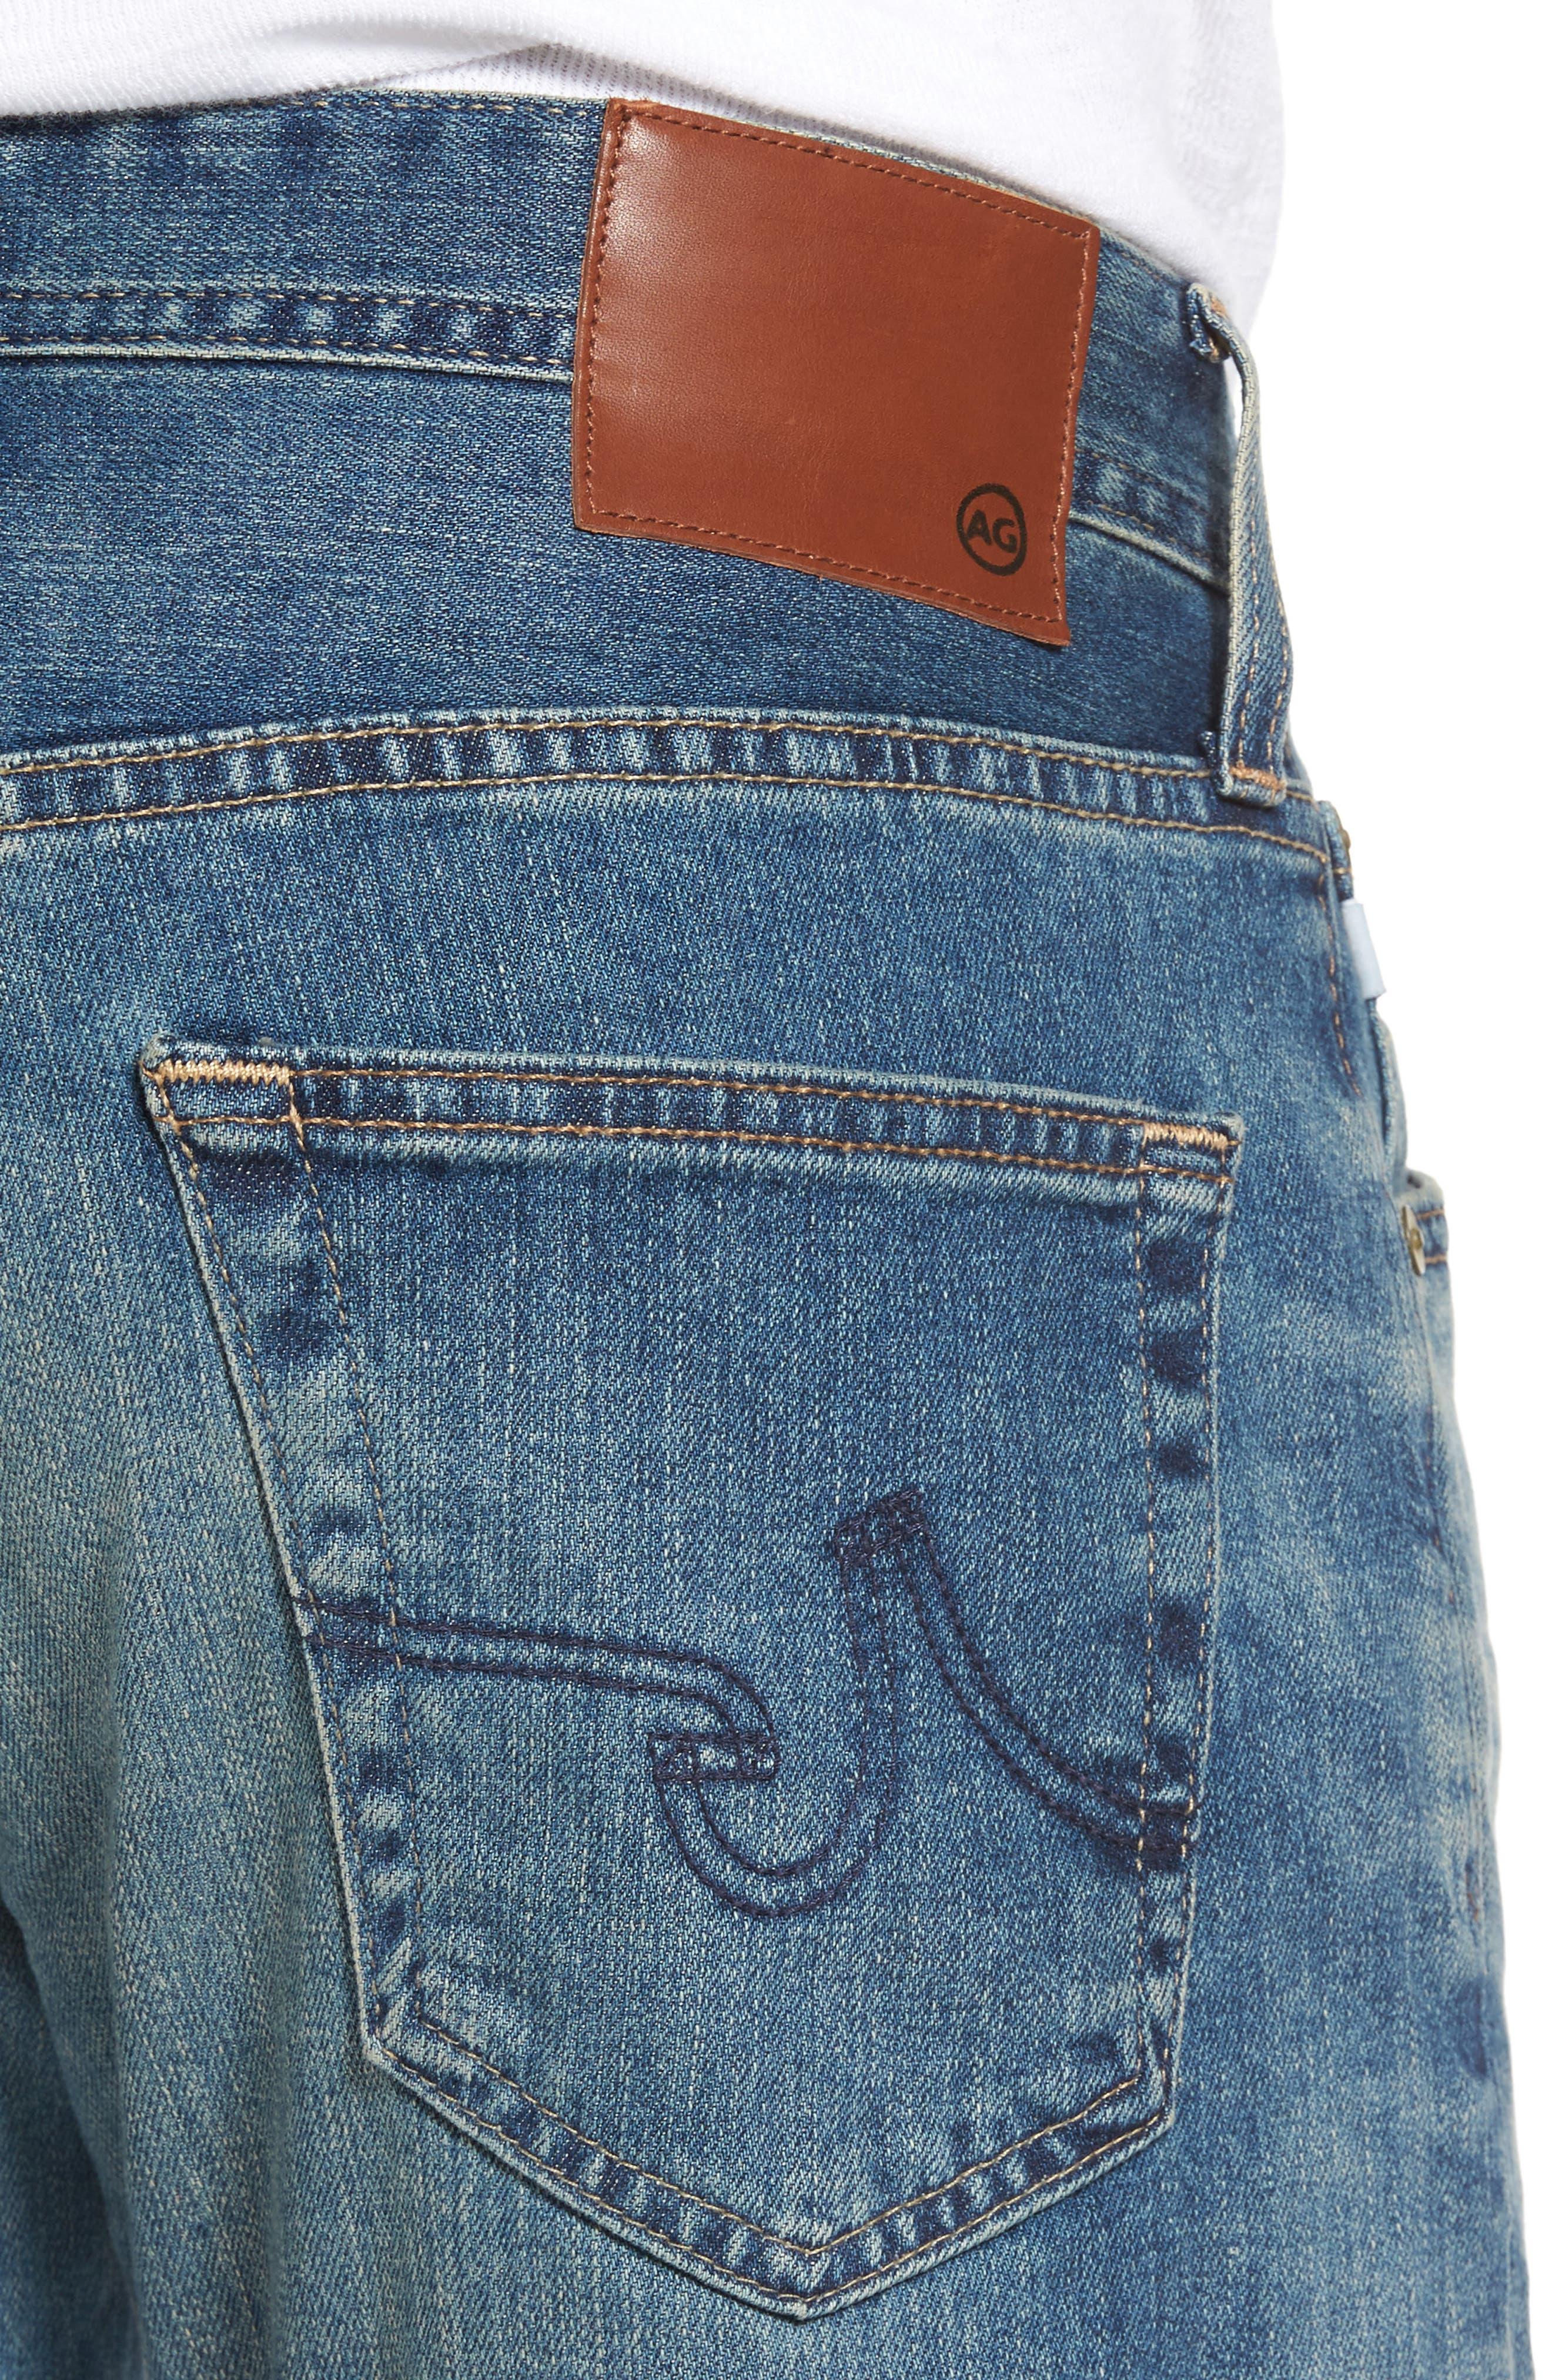 Graduate Slim Straight Leg Jeans,                             Alternate thumbnail 4, color,                             14 Years Century